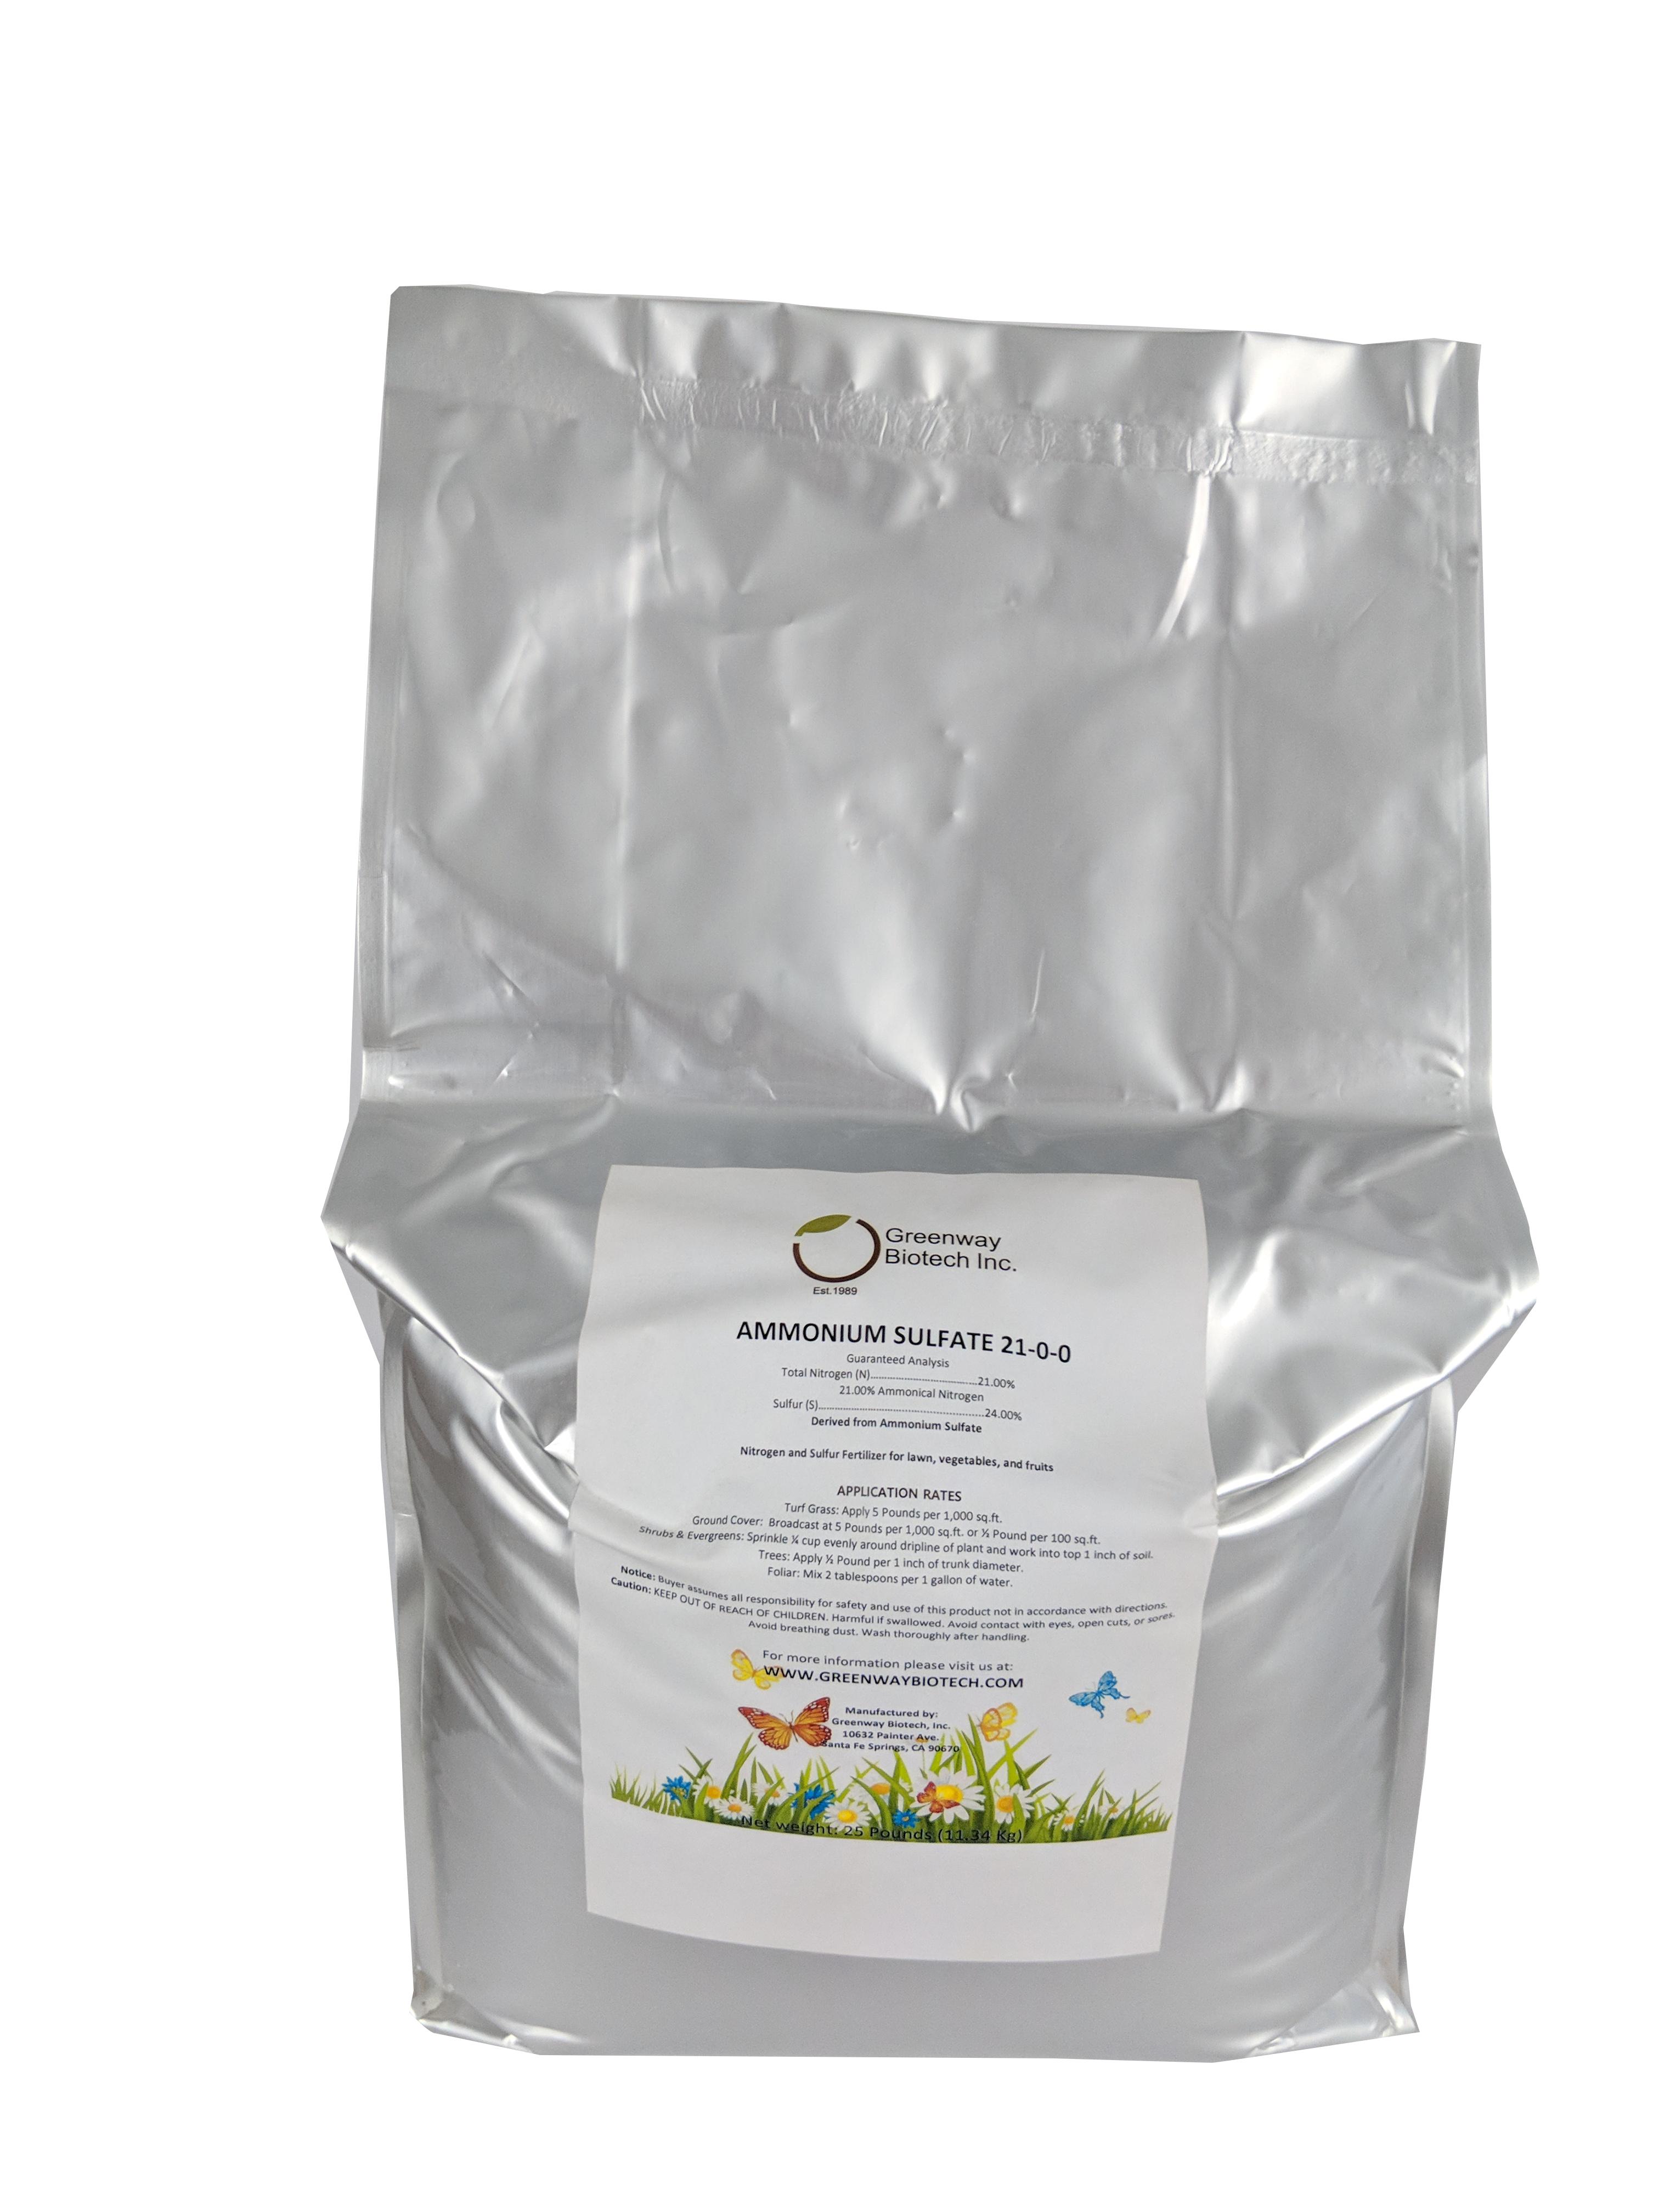 Ammonium sulfate products